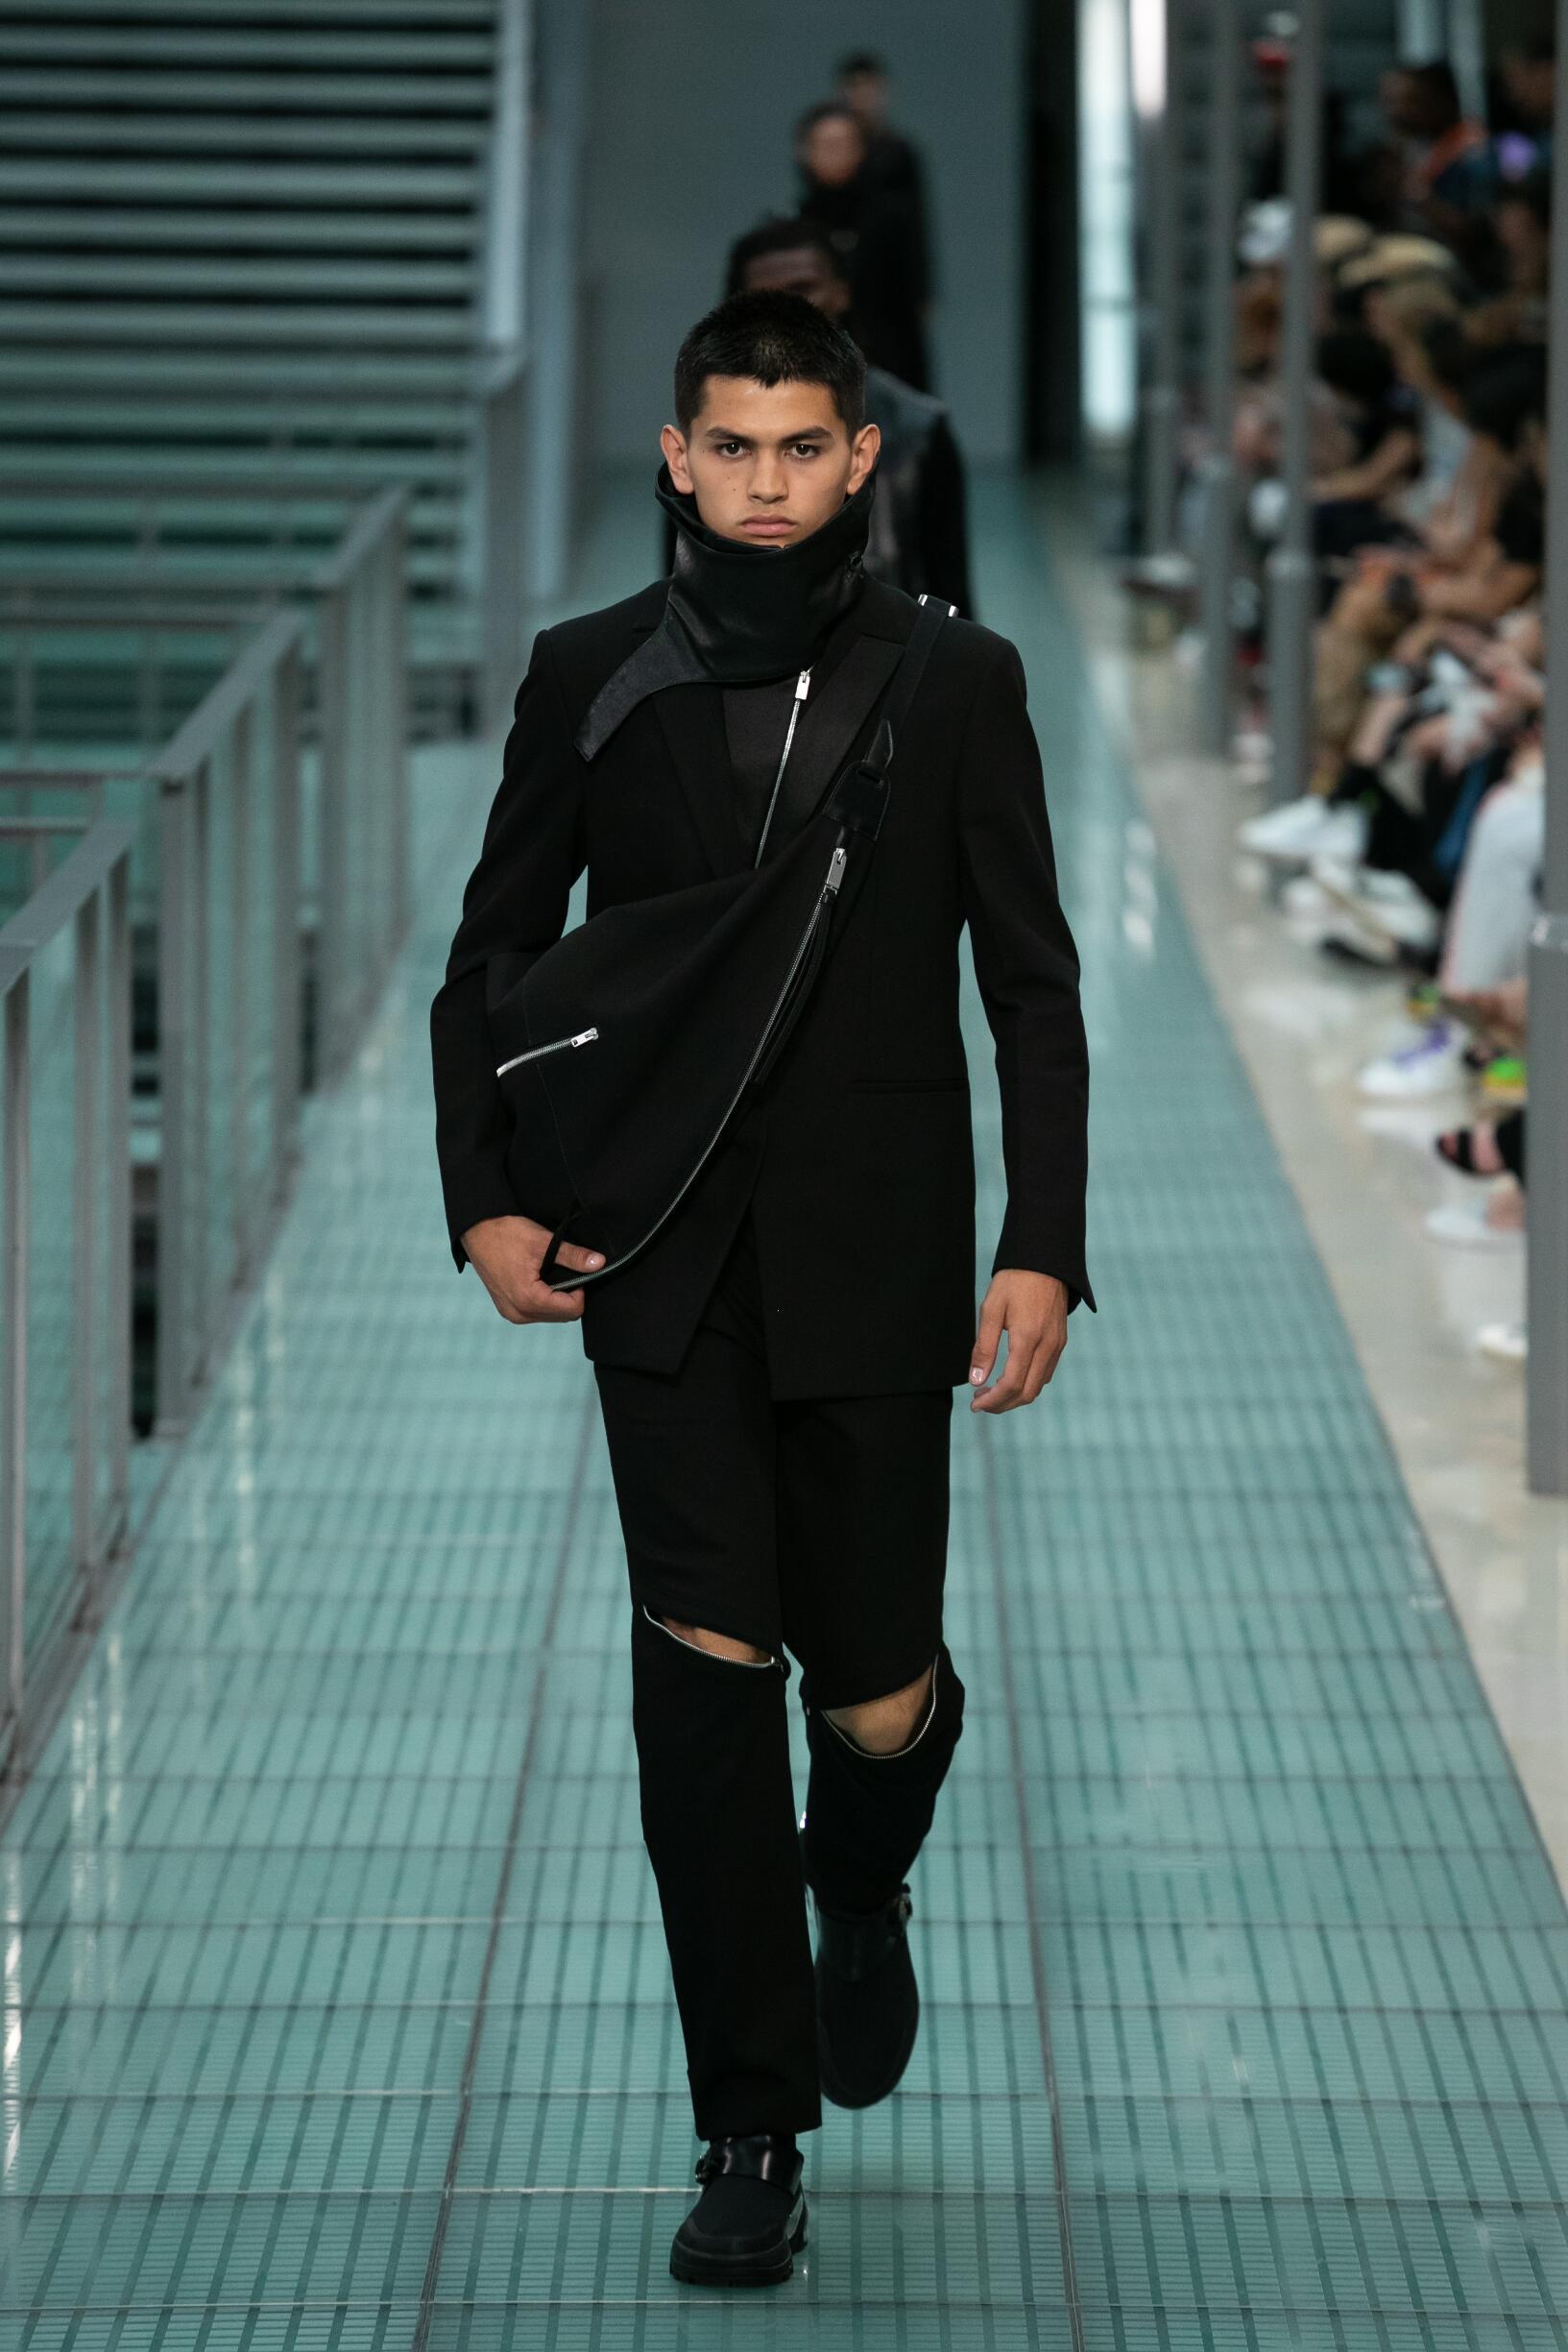 Alyx SS 2020 Menswear